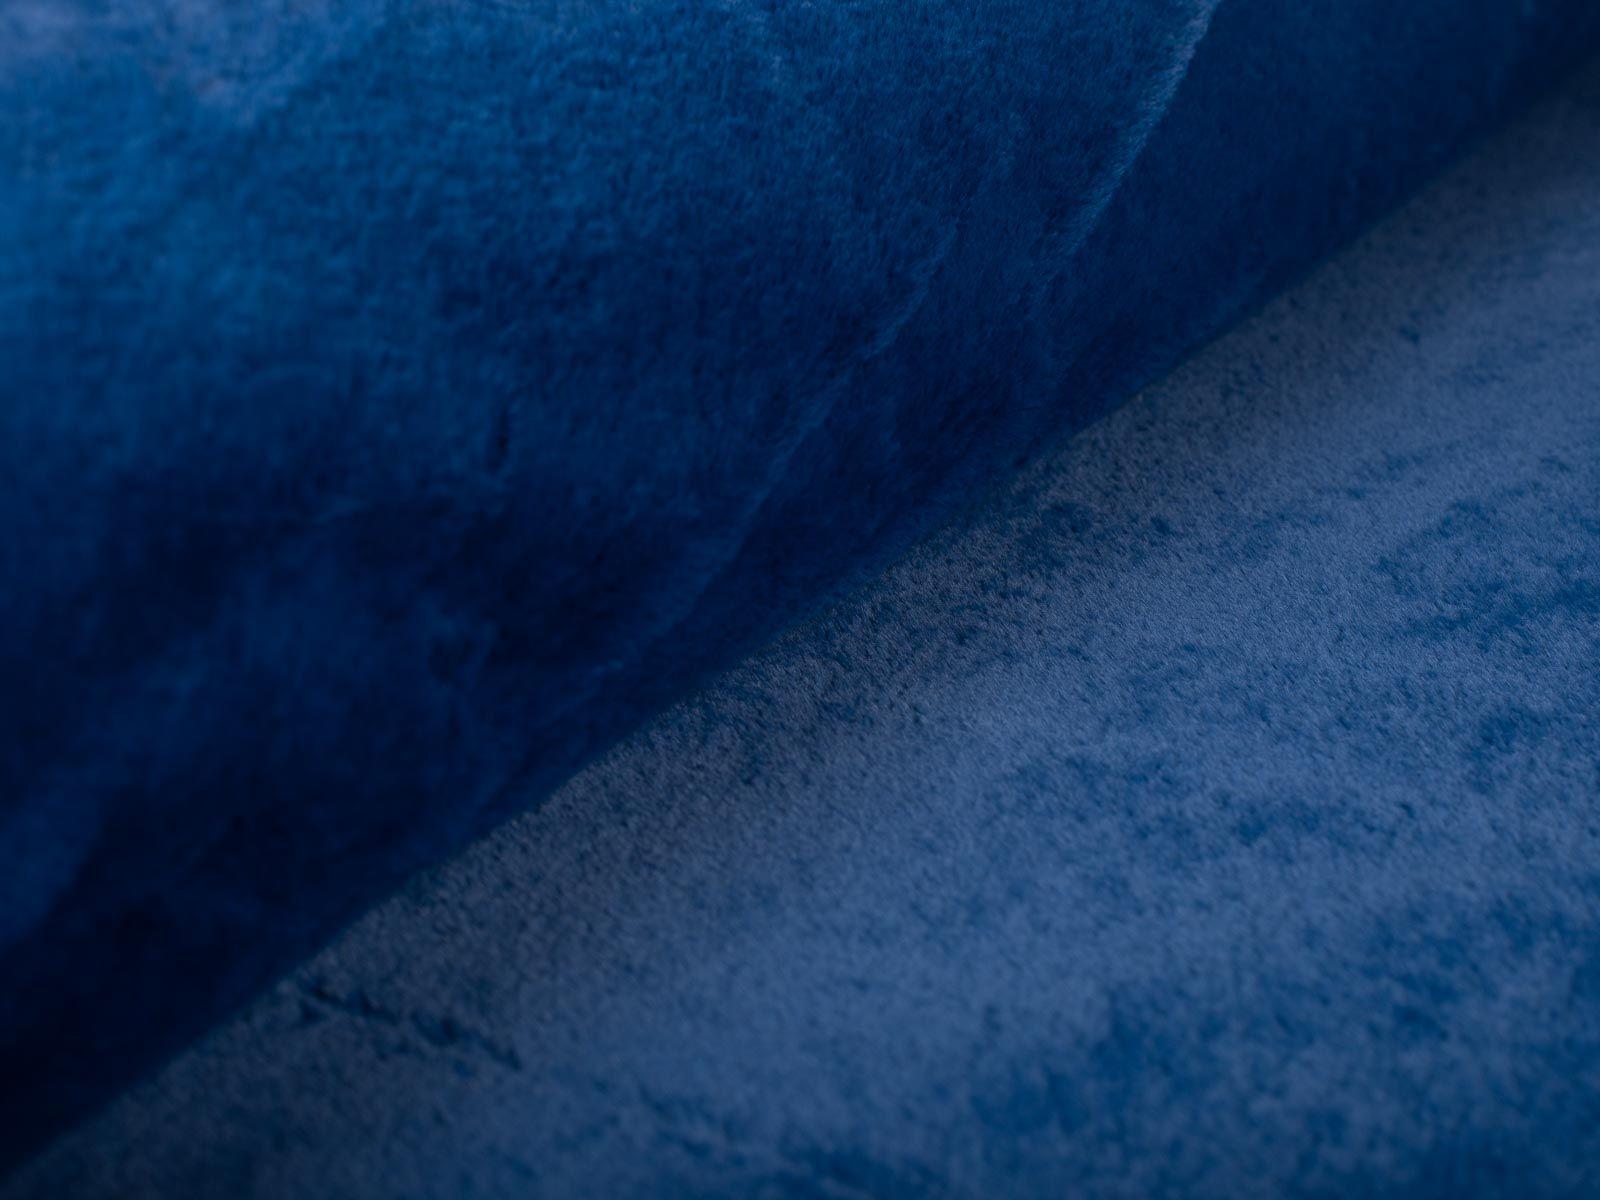 Wechselbezug Blue